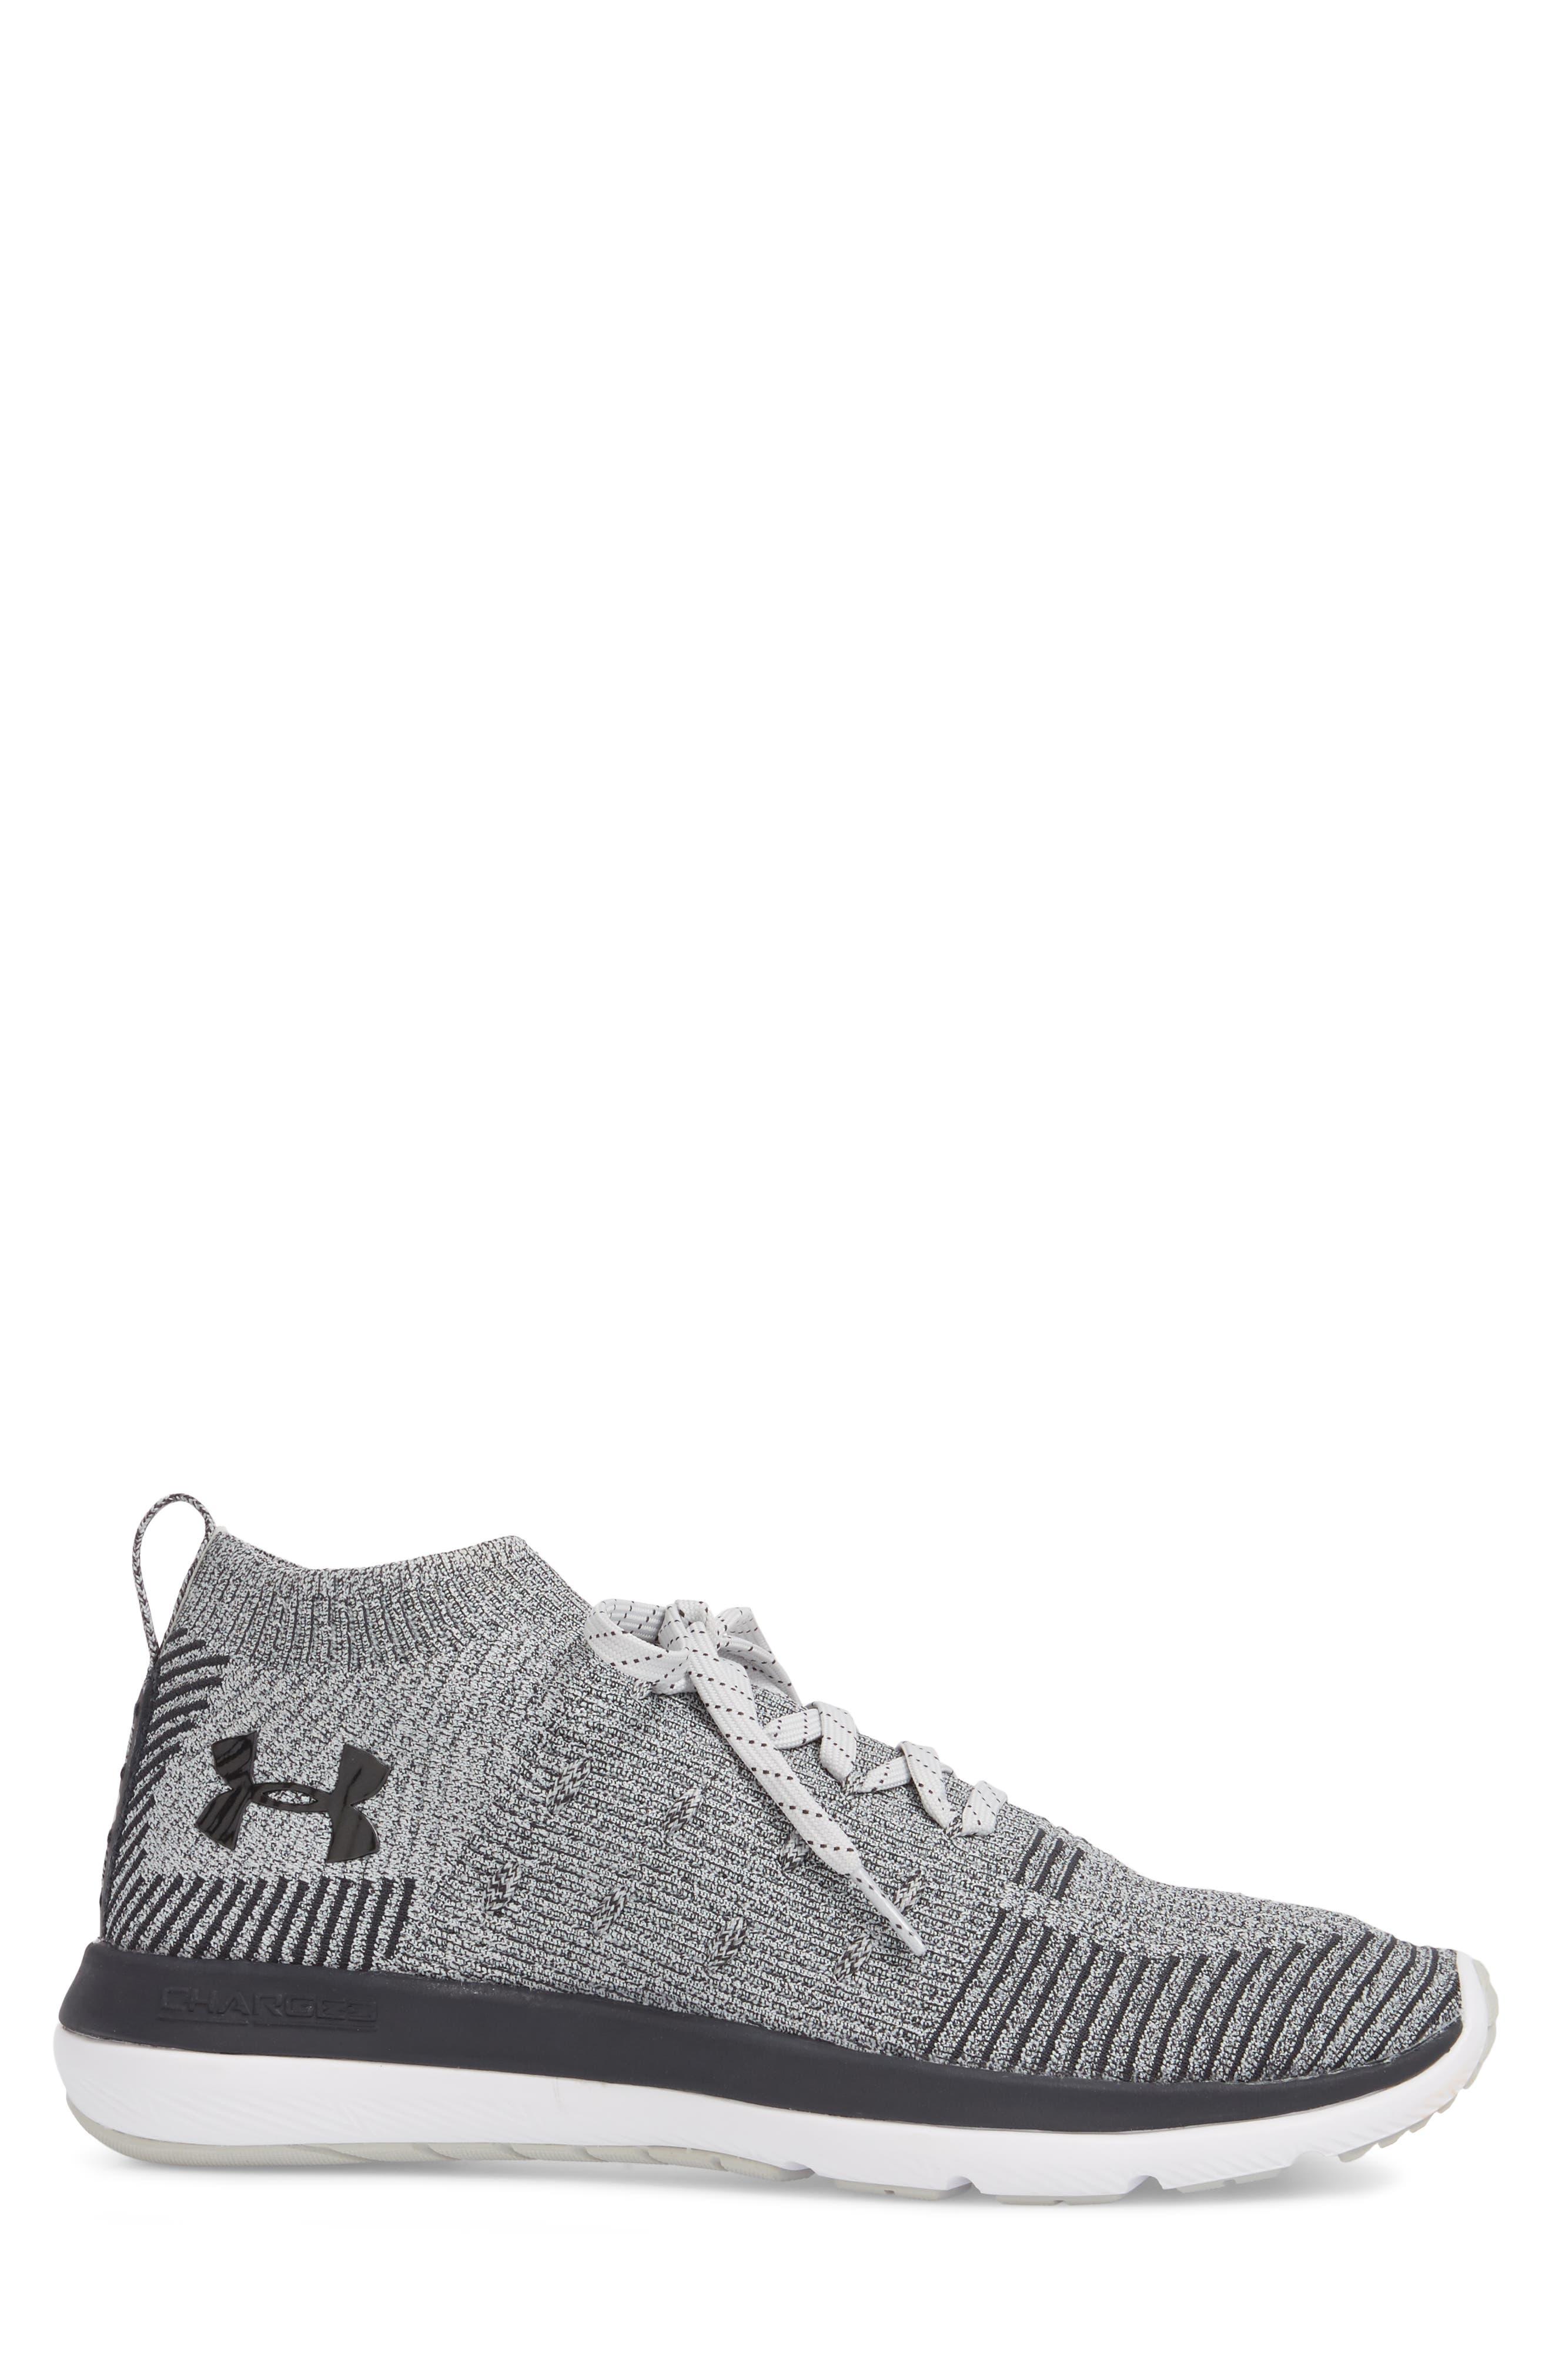 Slingflex Rise Sneaker,                             Alternate thumbnail 3, color,                             ELEMENTAL/ ANTHRACITE